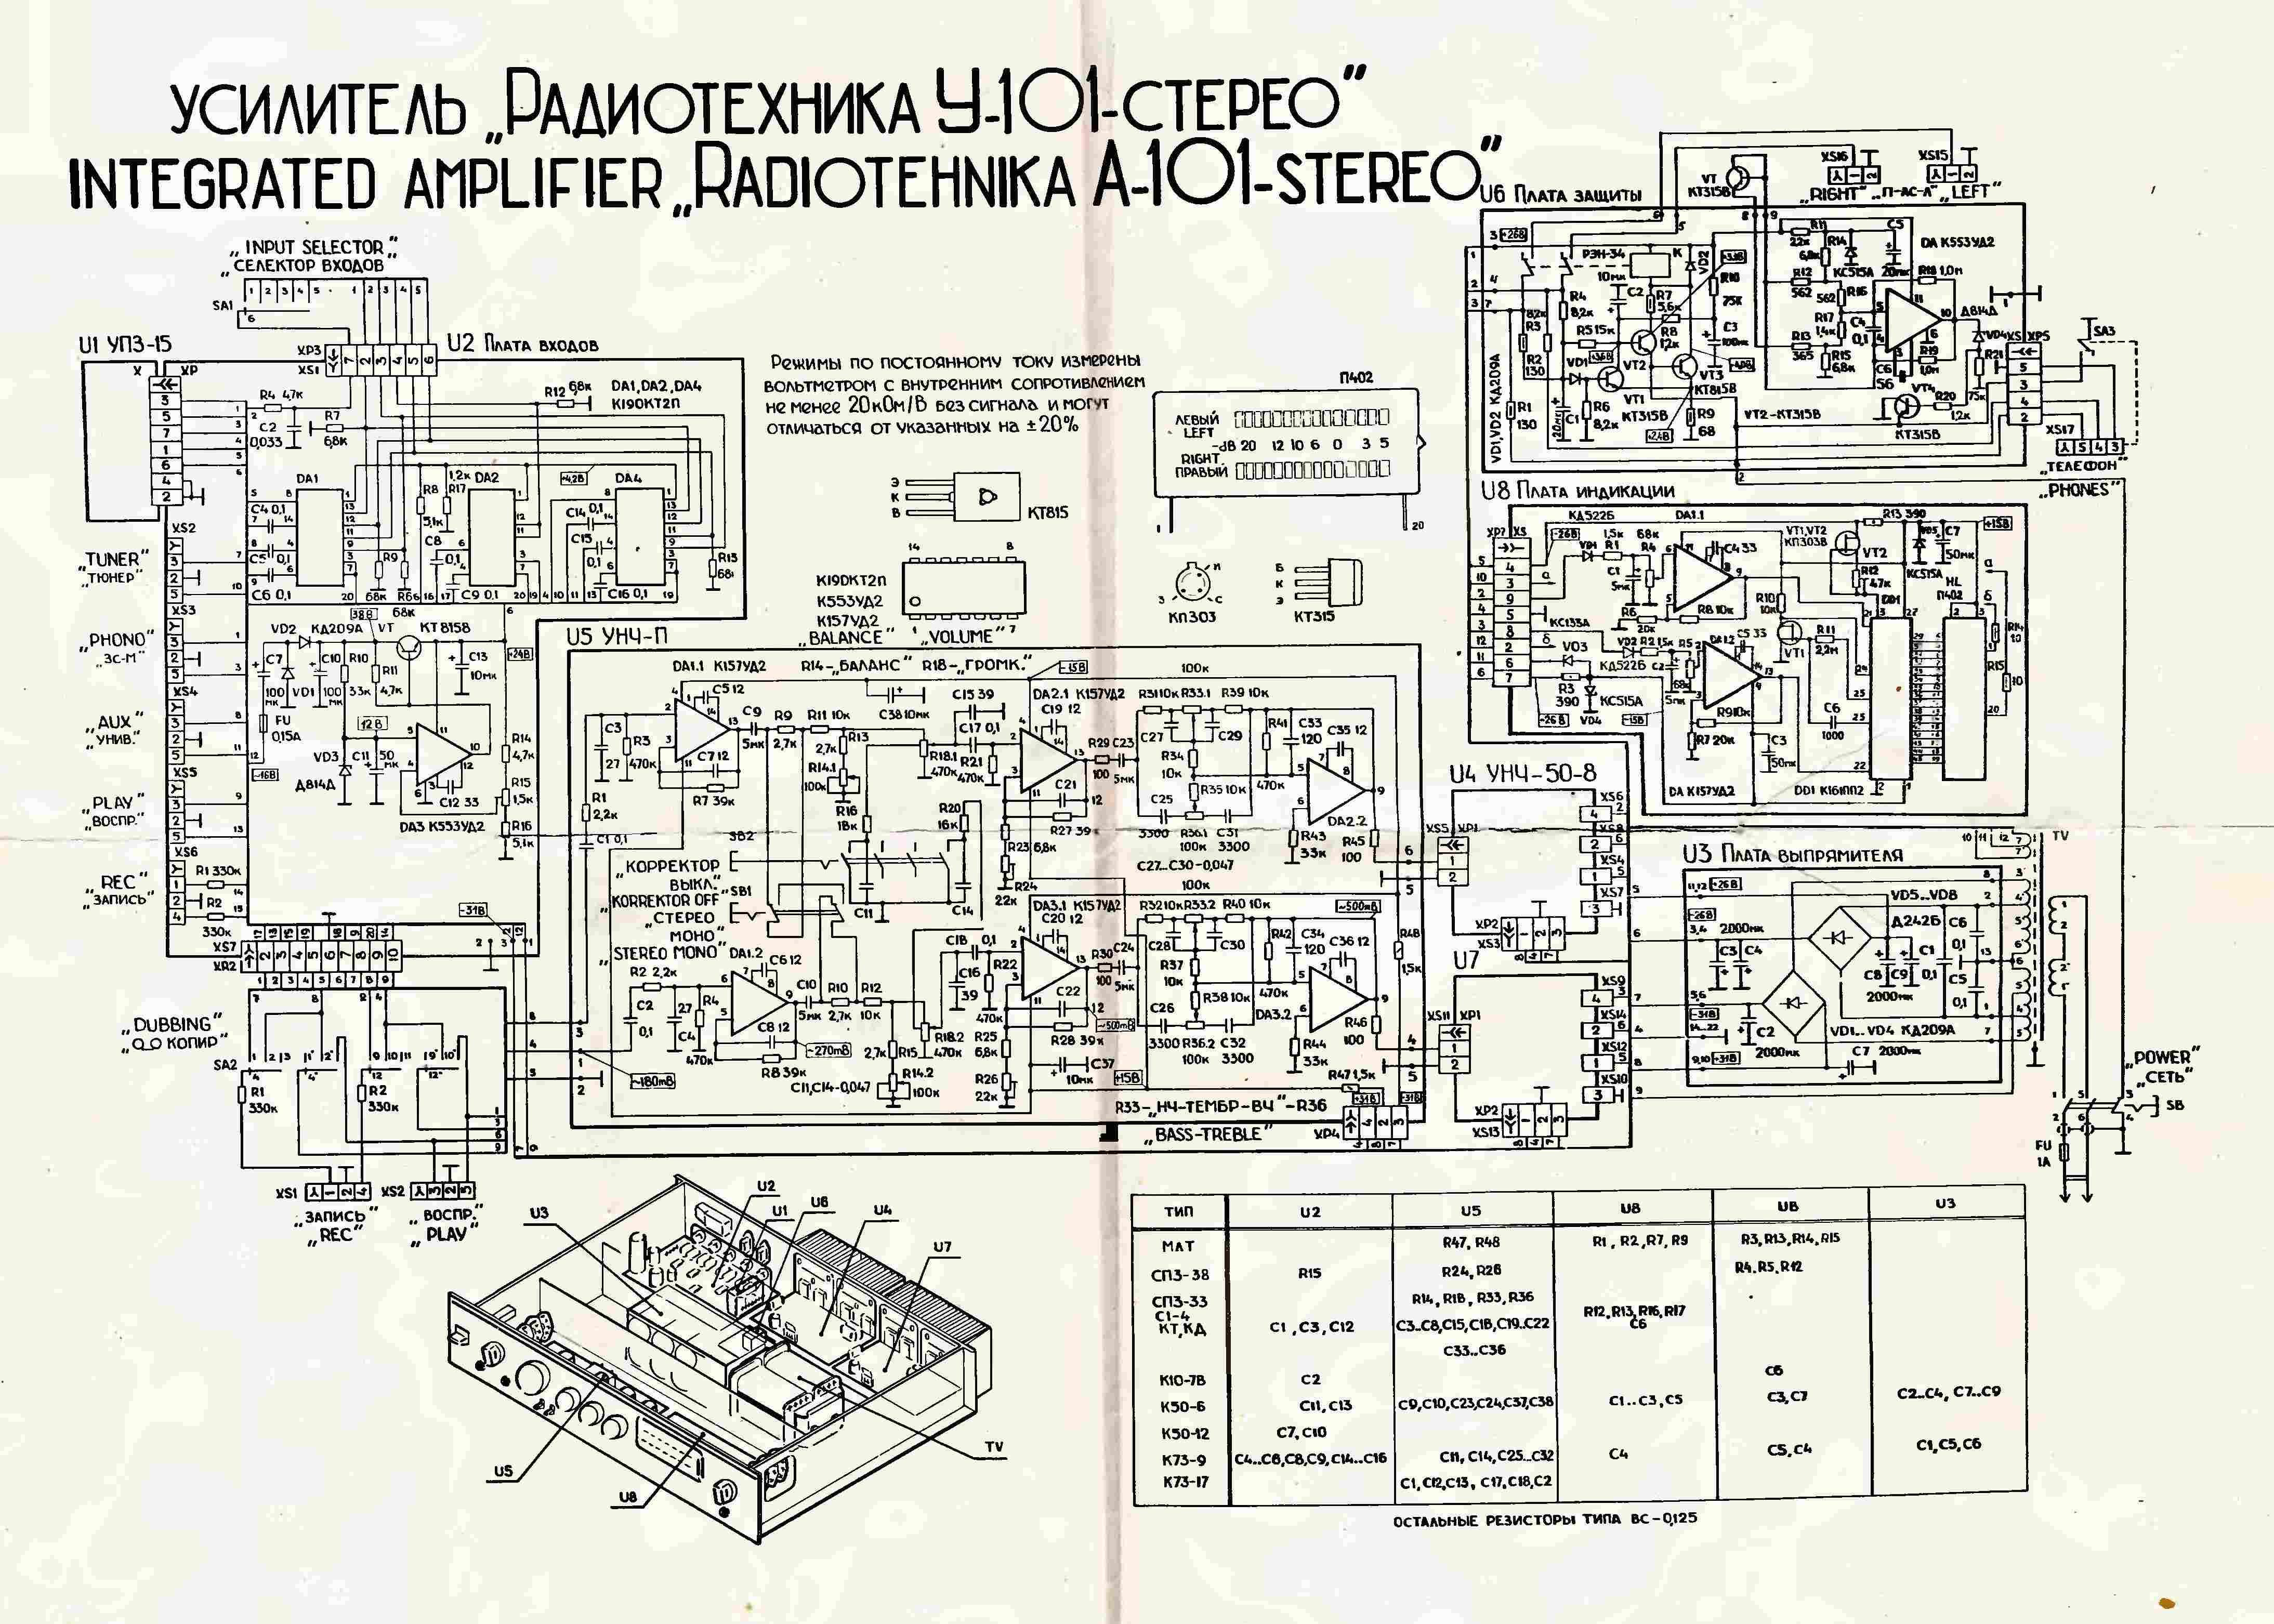 Ремонт радиоаппаратуры схема